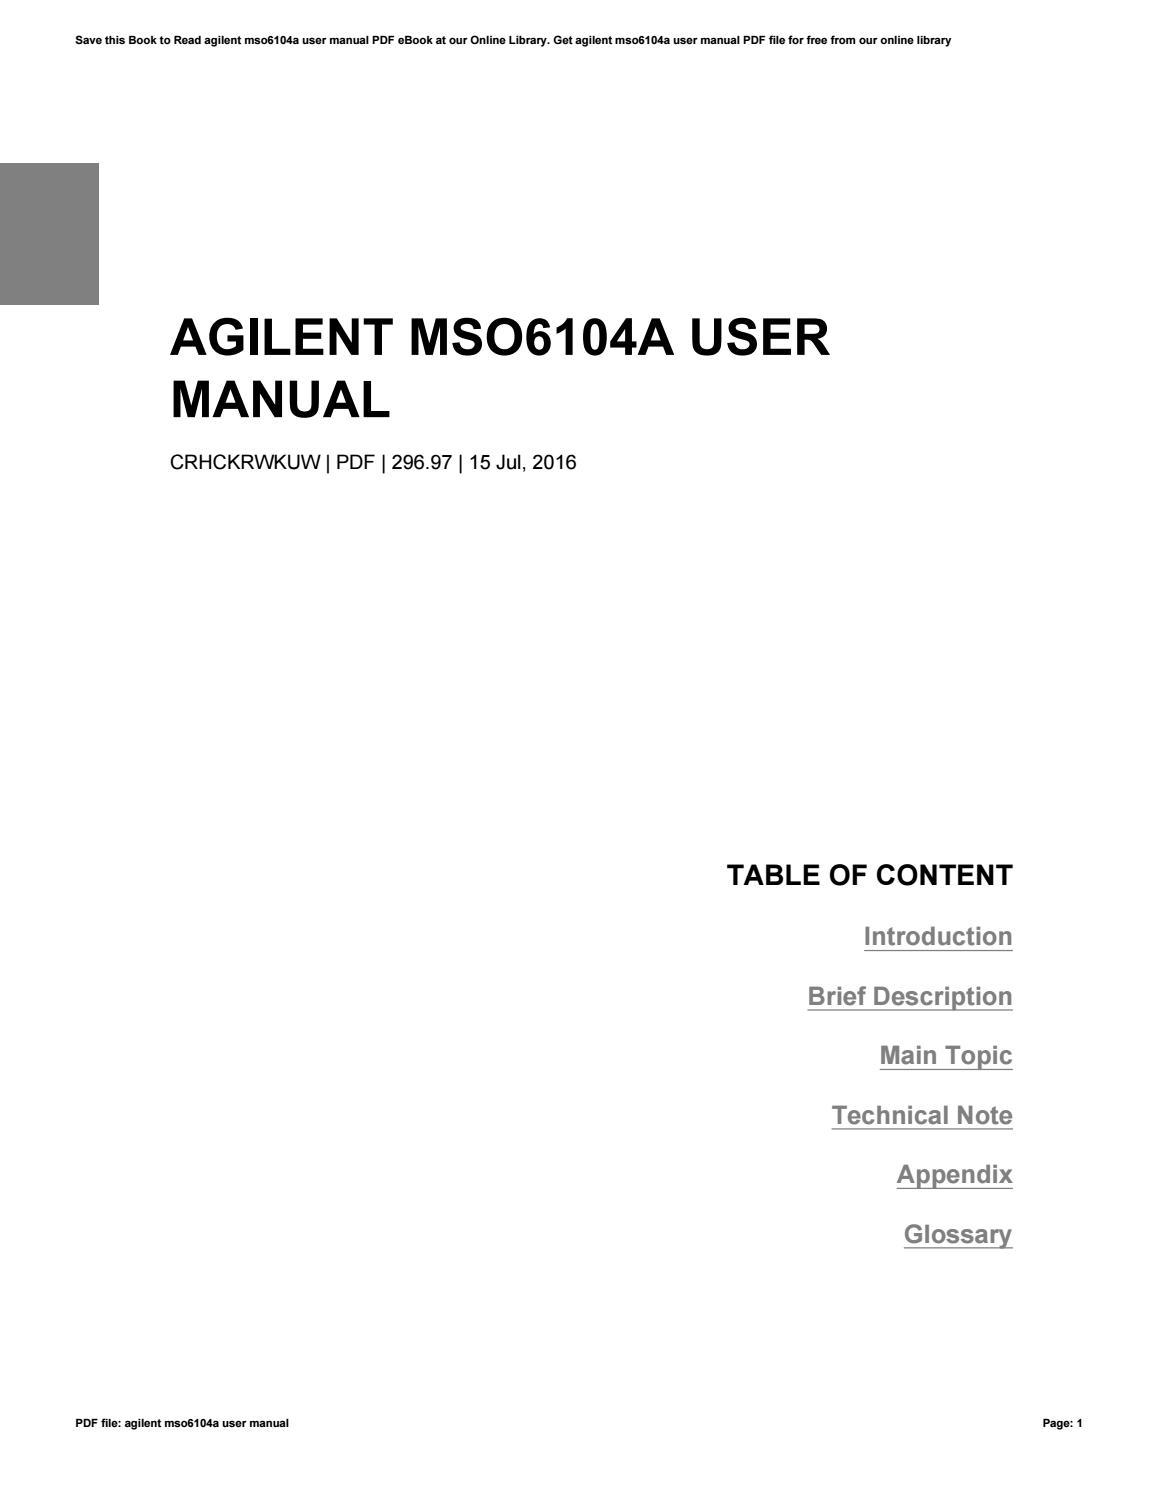 ... Array - 2004 bmw x3 owners manual pdf ebook rh 2004 bmw x3 owners manual  pdf